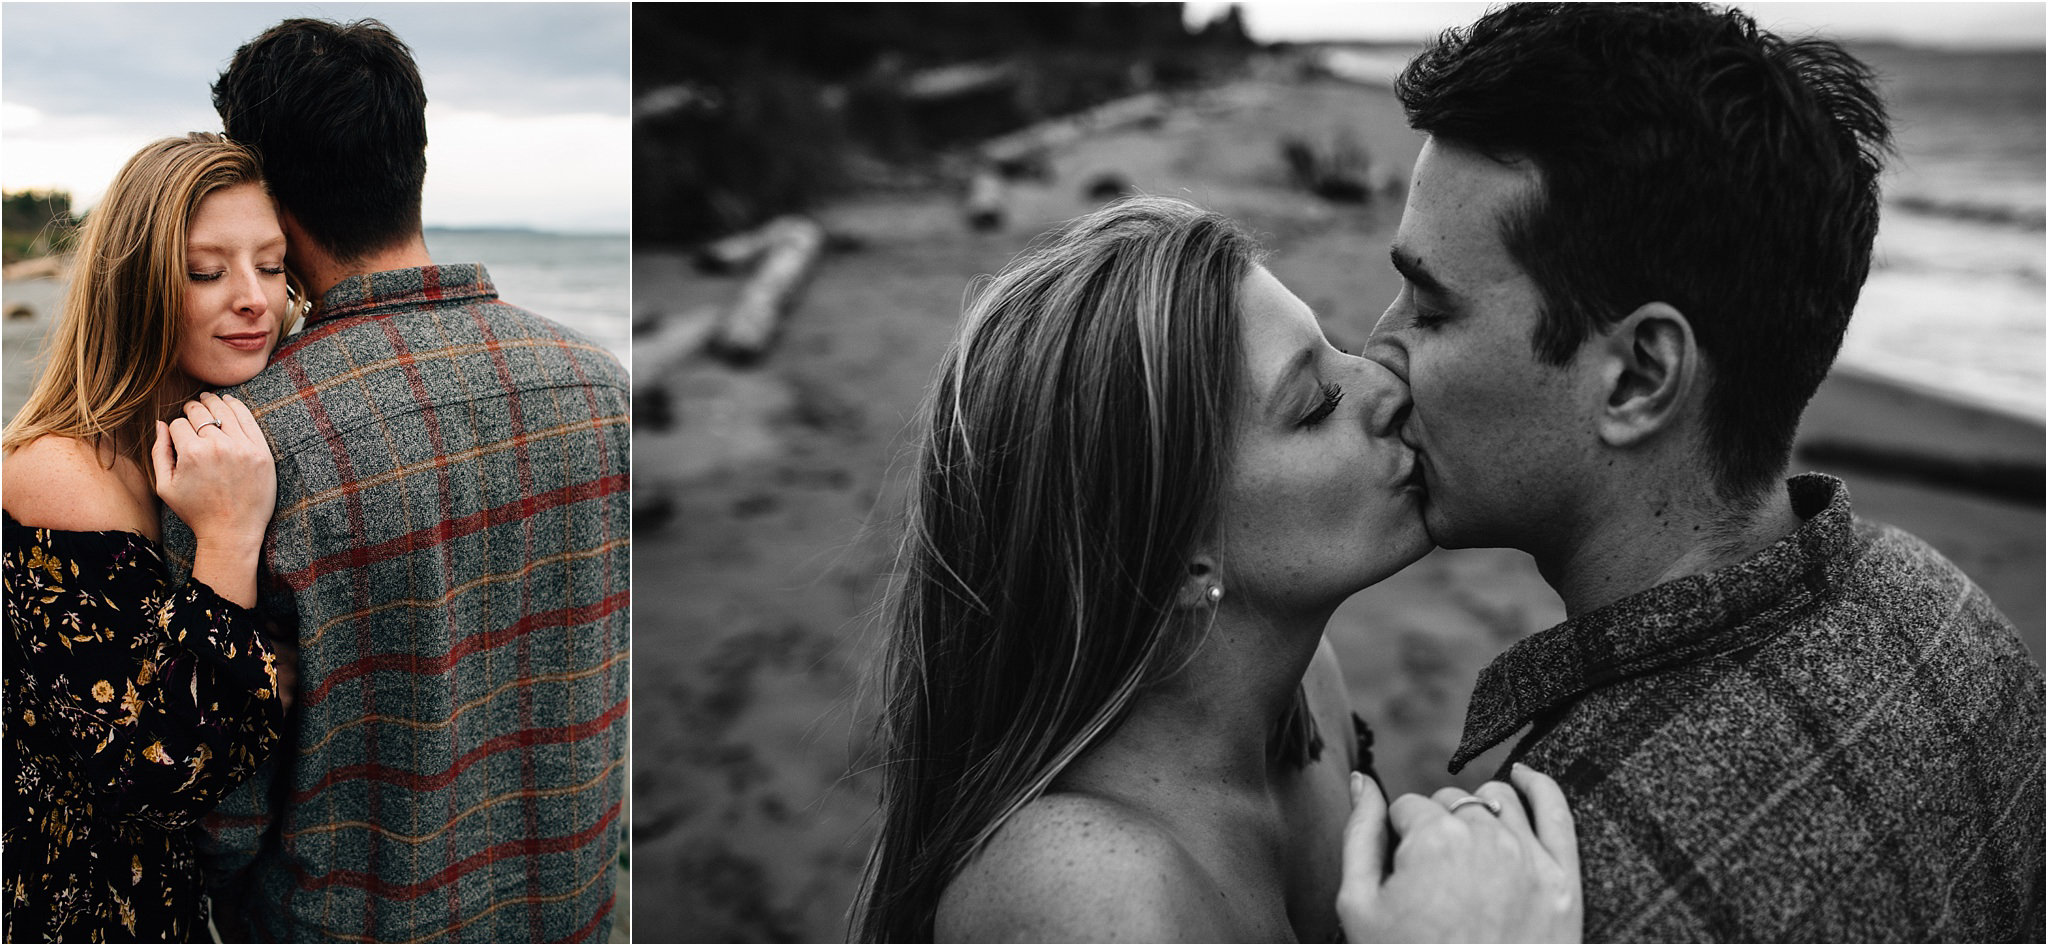 oak-harbor-couples-photographer-deception-pass-53.jpg